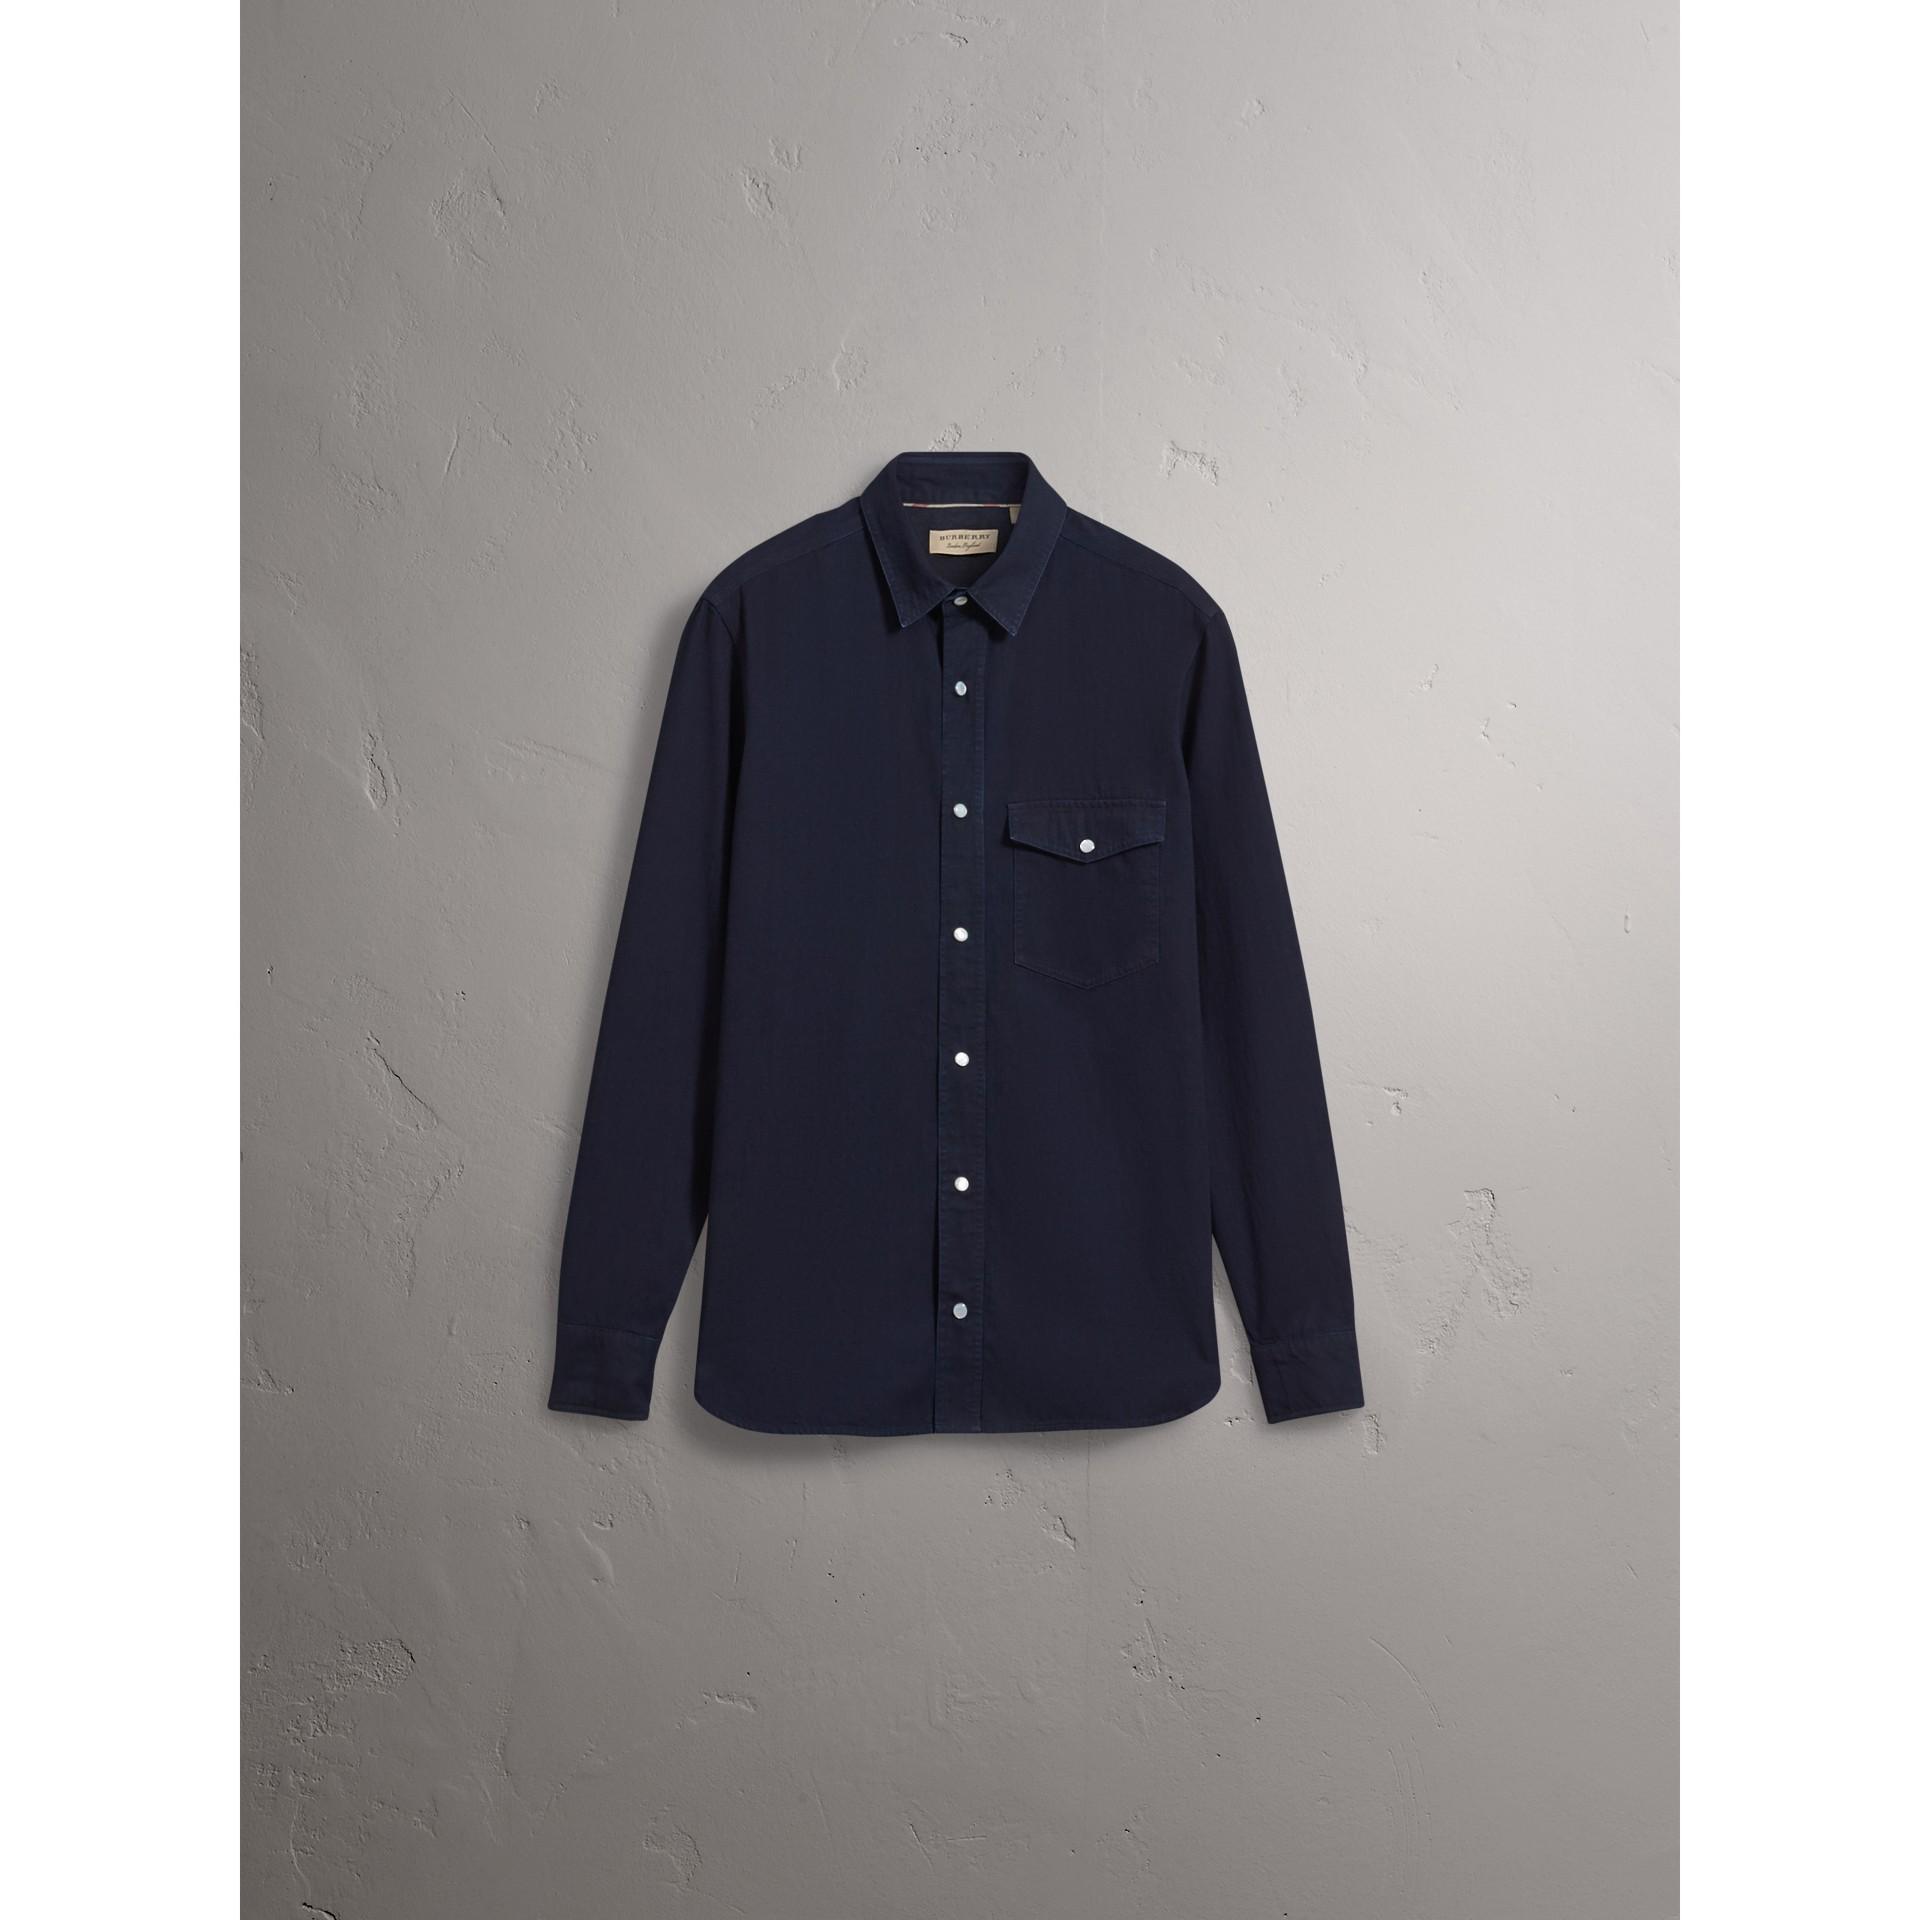 Japanese Denim Shirt in Indigo - Men | Burberry United States - gallery image 3